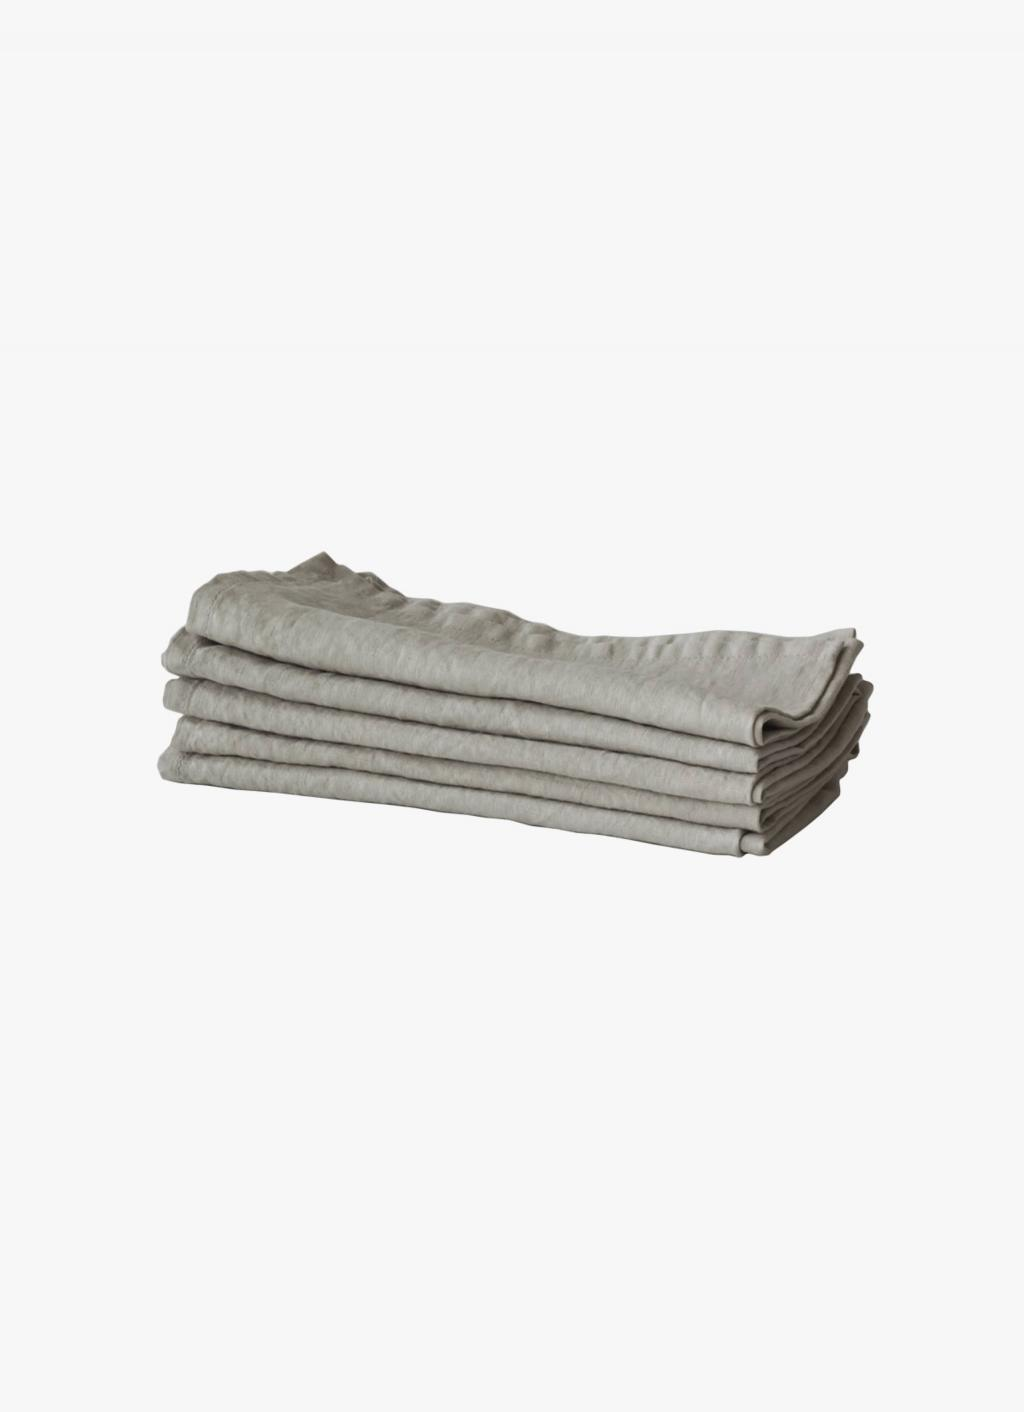 Tell Me More - Linen Napkin - Warm Grey